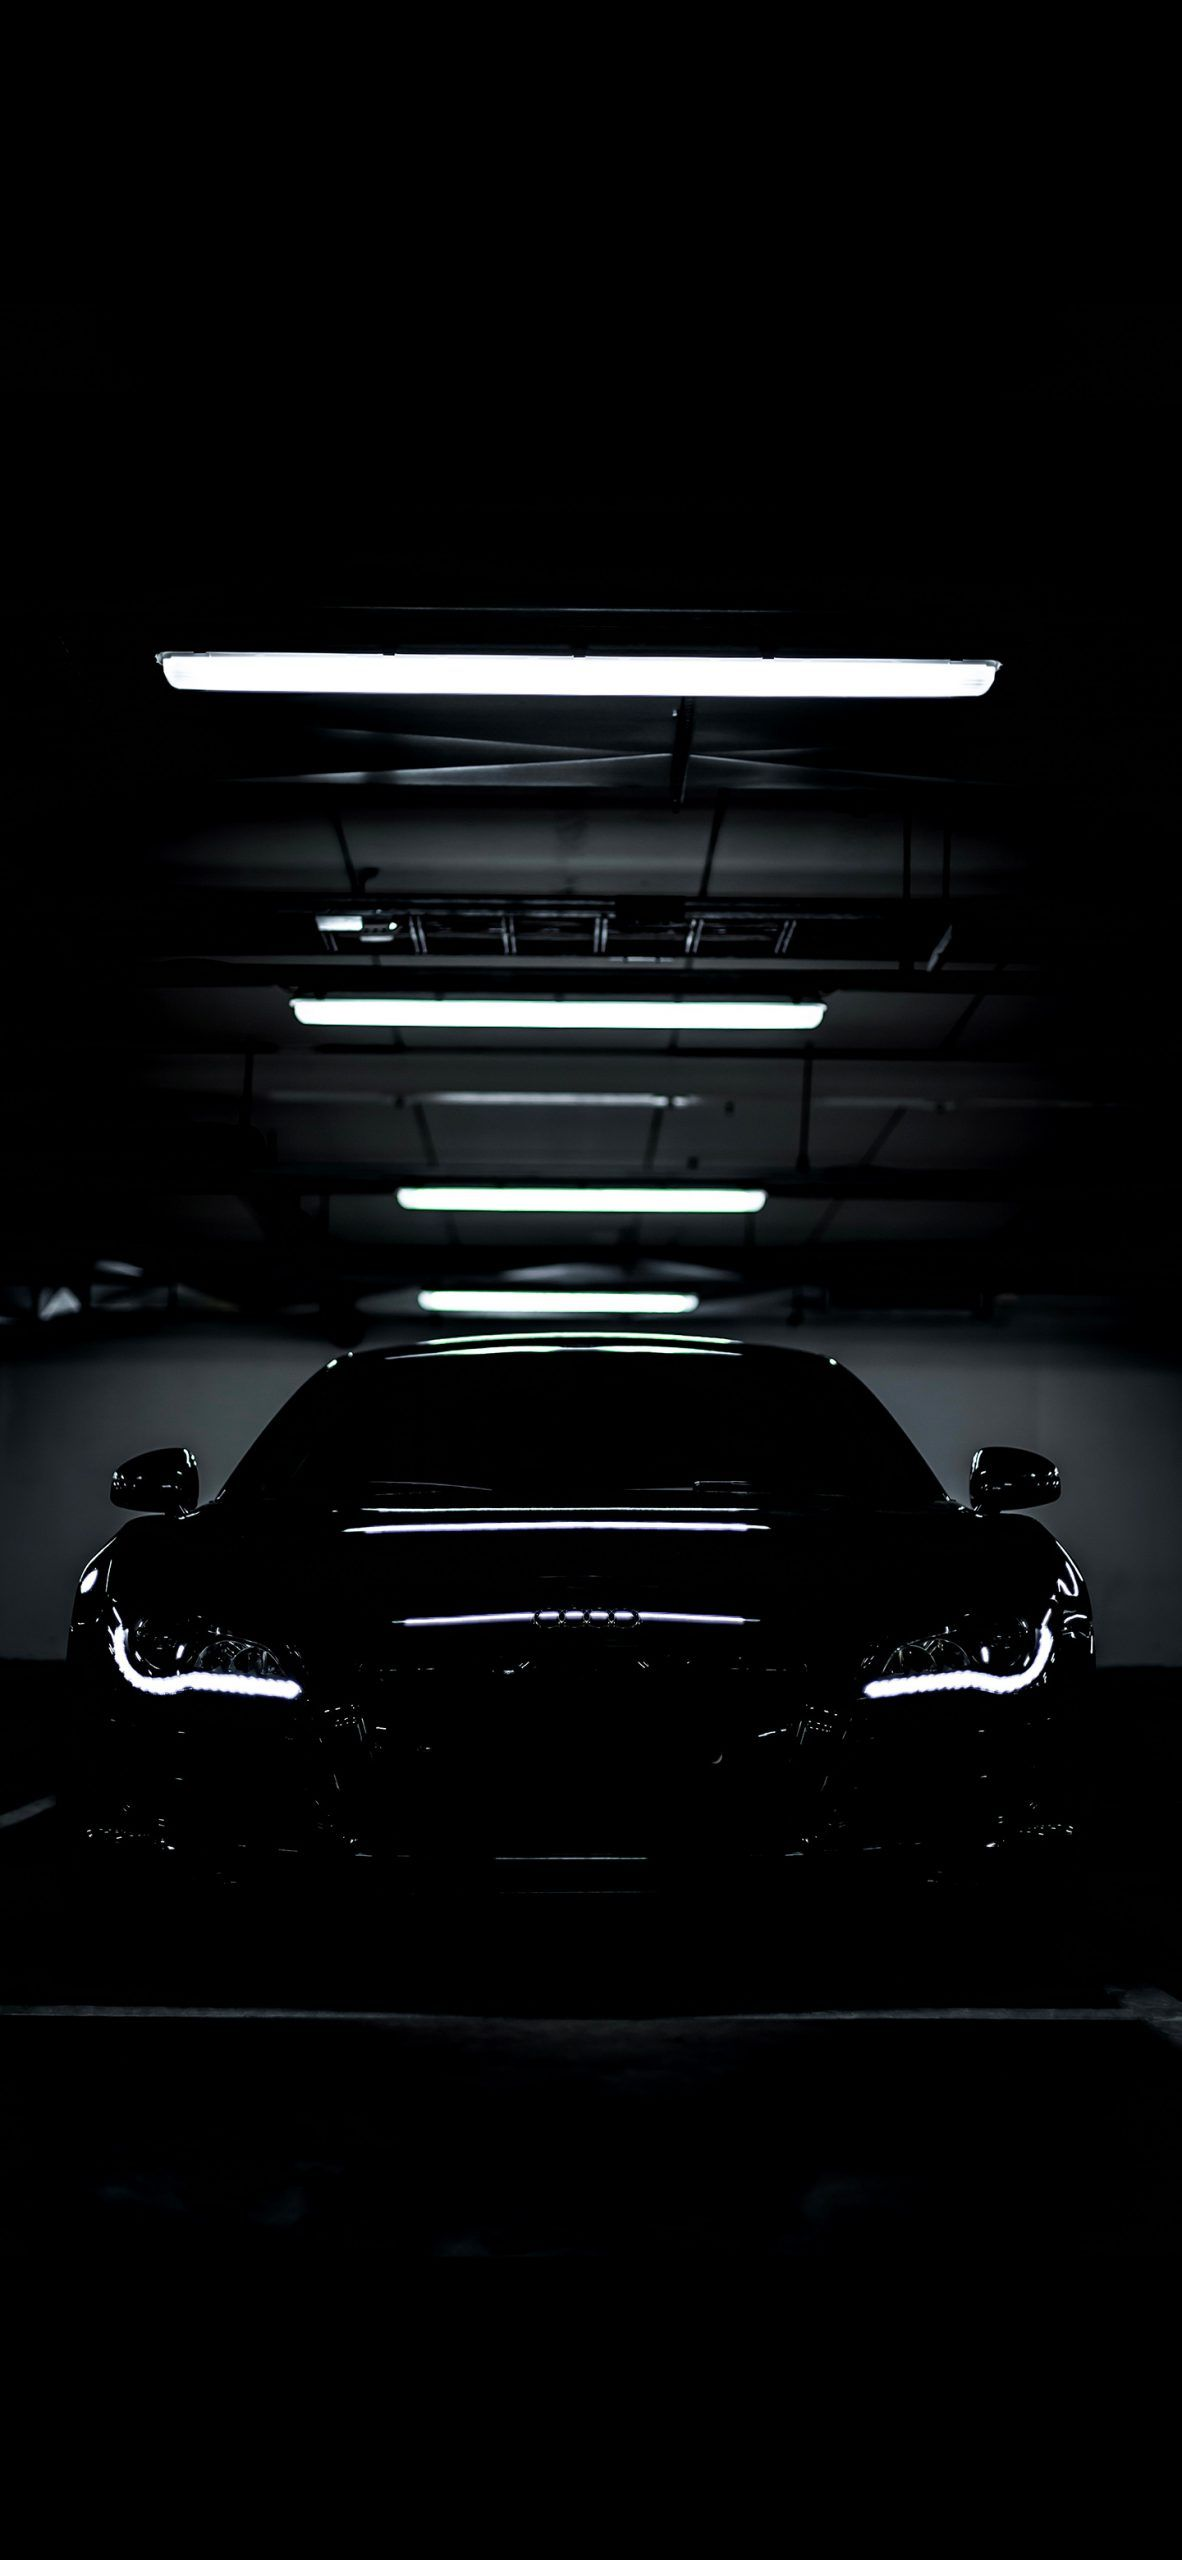 Parked Black Audi R8 In 2020 Black Audi Audi R8 Wallpaper Black Wallpaper Iphone